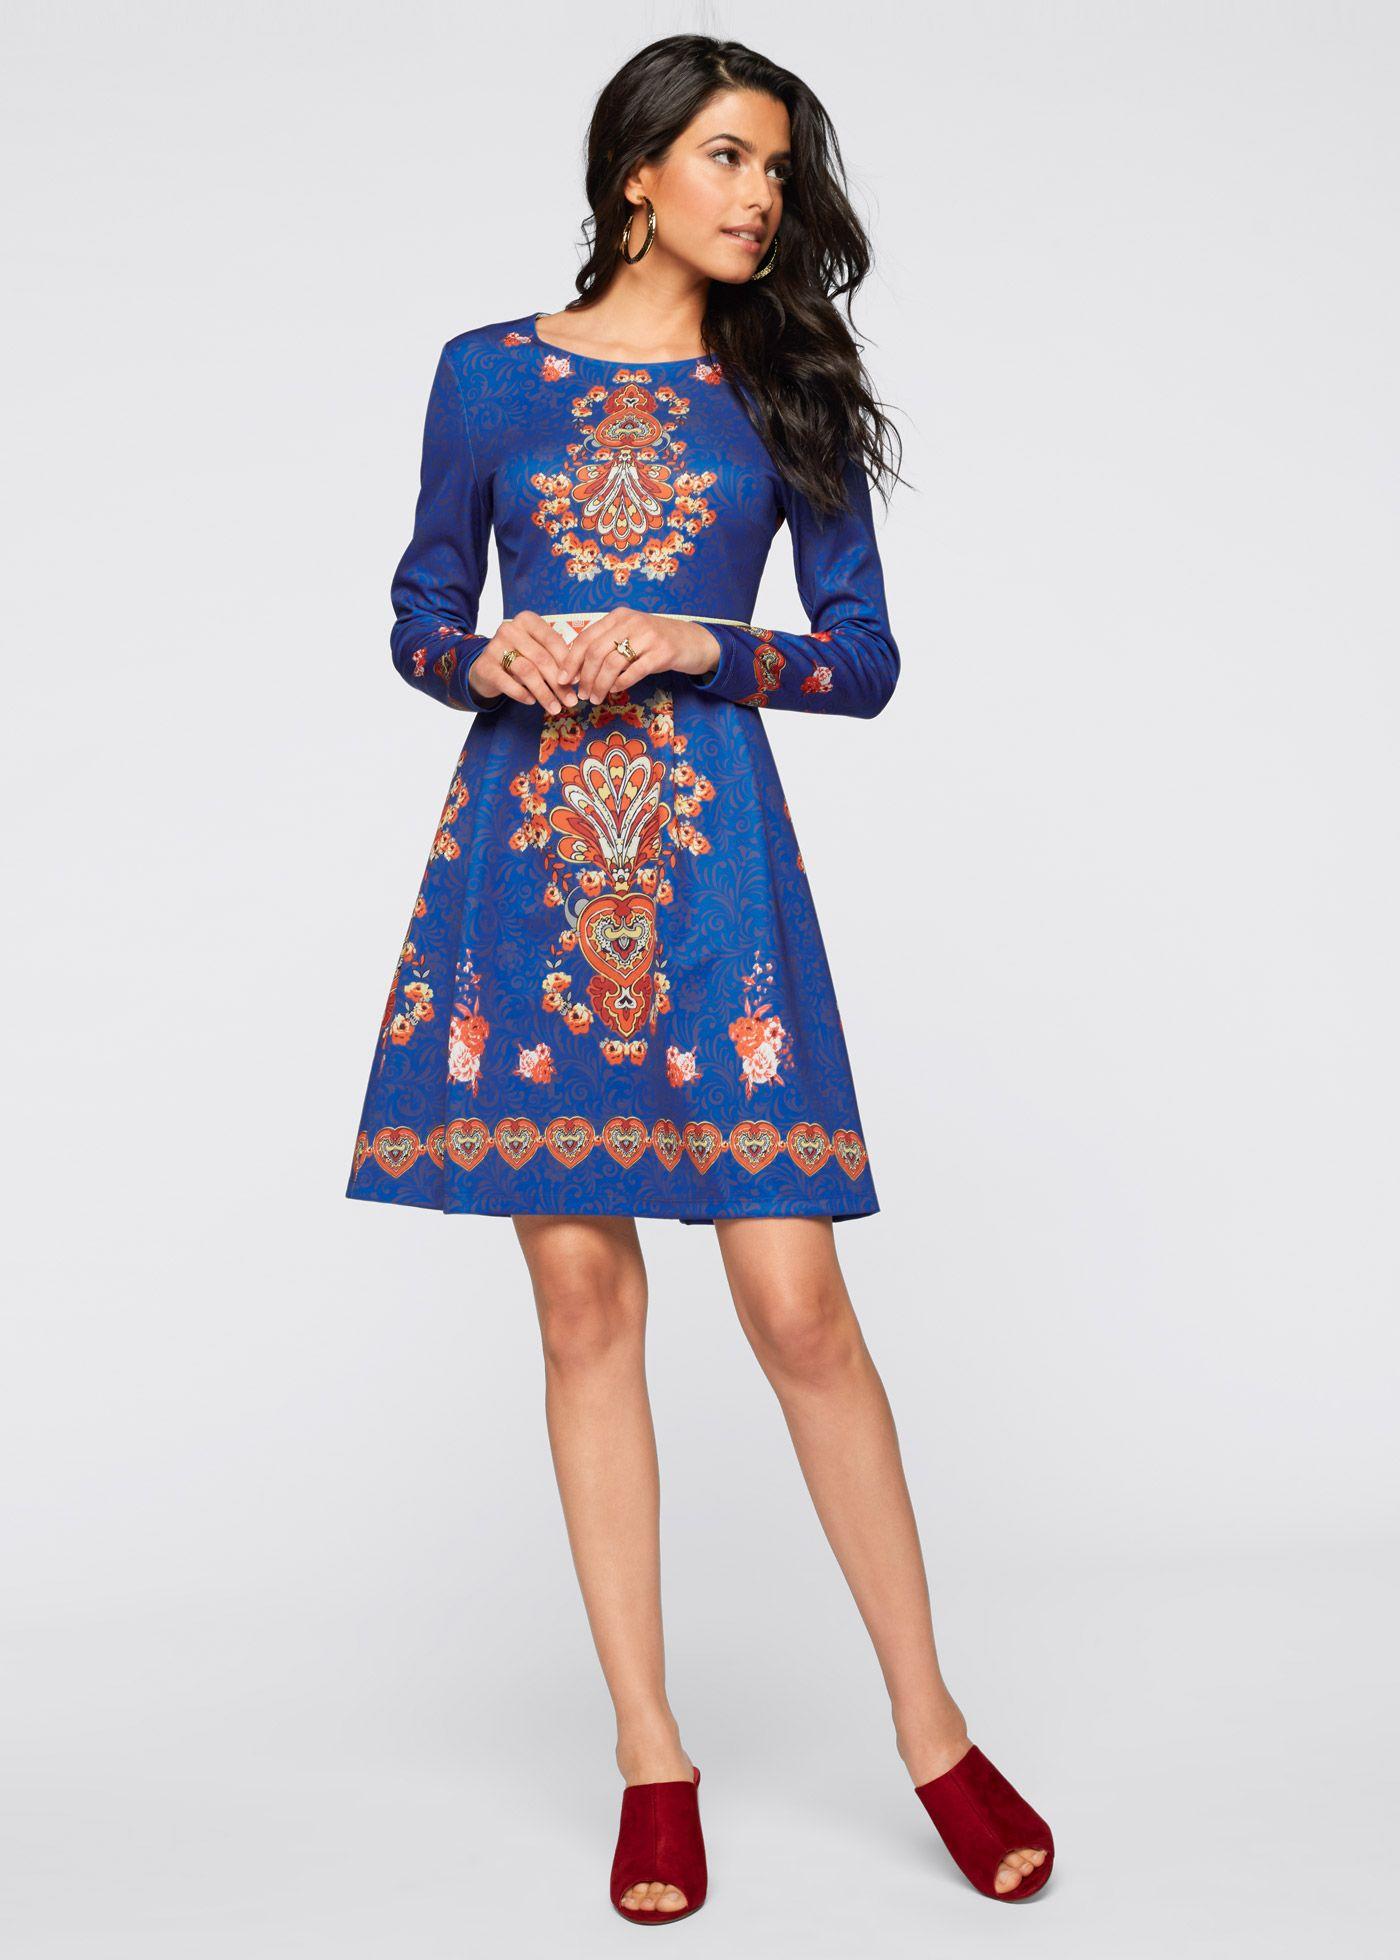 1d69fe38e Bonprix Jurk, BODYFLIRT boutique, blauw print ethnic dress blue ...